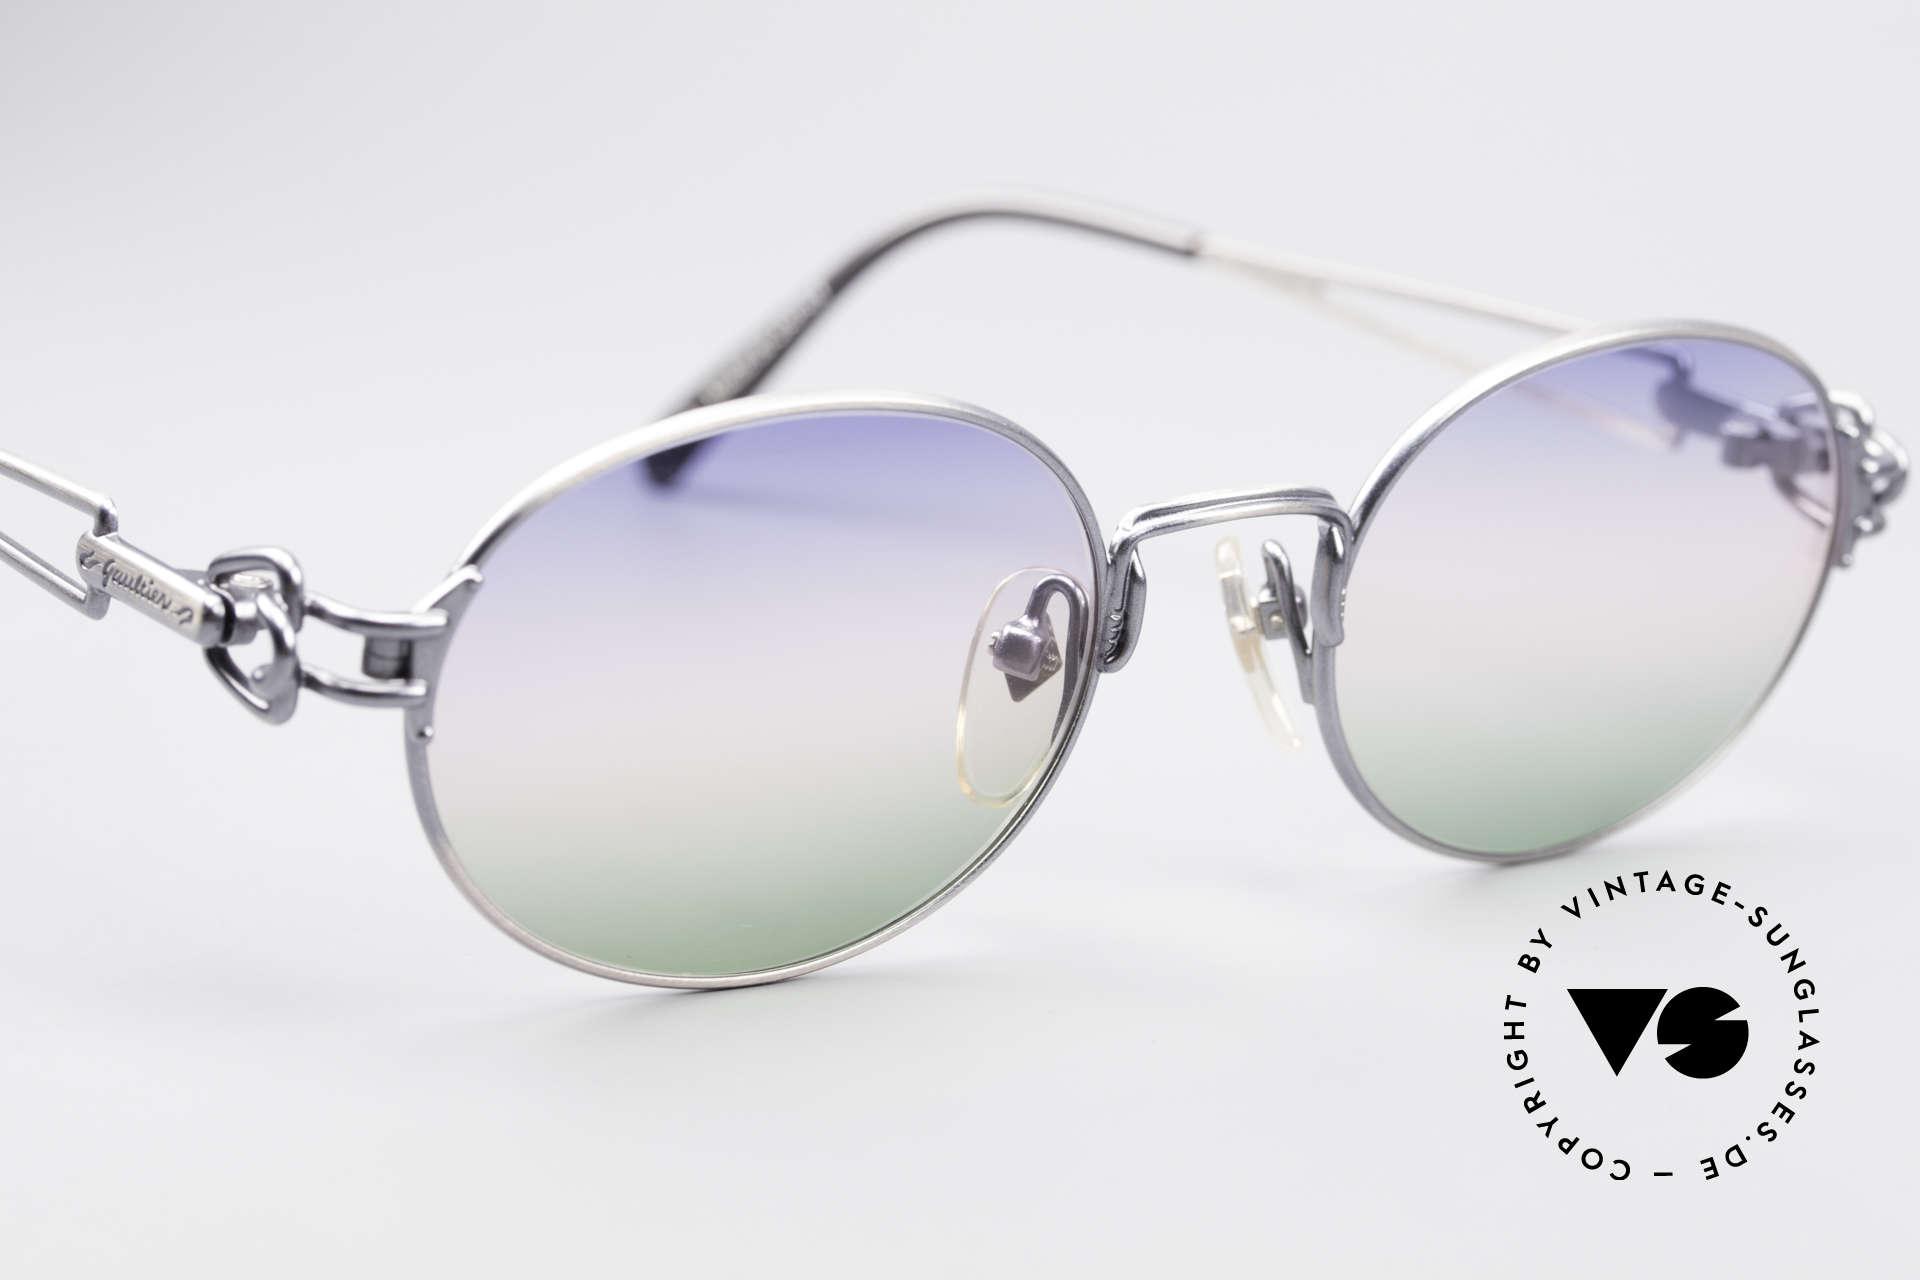 Jean Paul Gaultier 55-6112 Oval Designer Sunglasses, unworn rarity (like all our old JPG designer sunglasses), Made for Men and Women